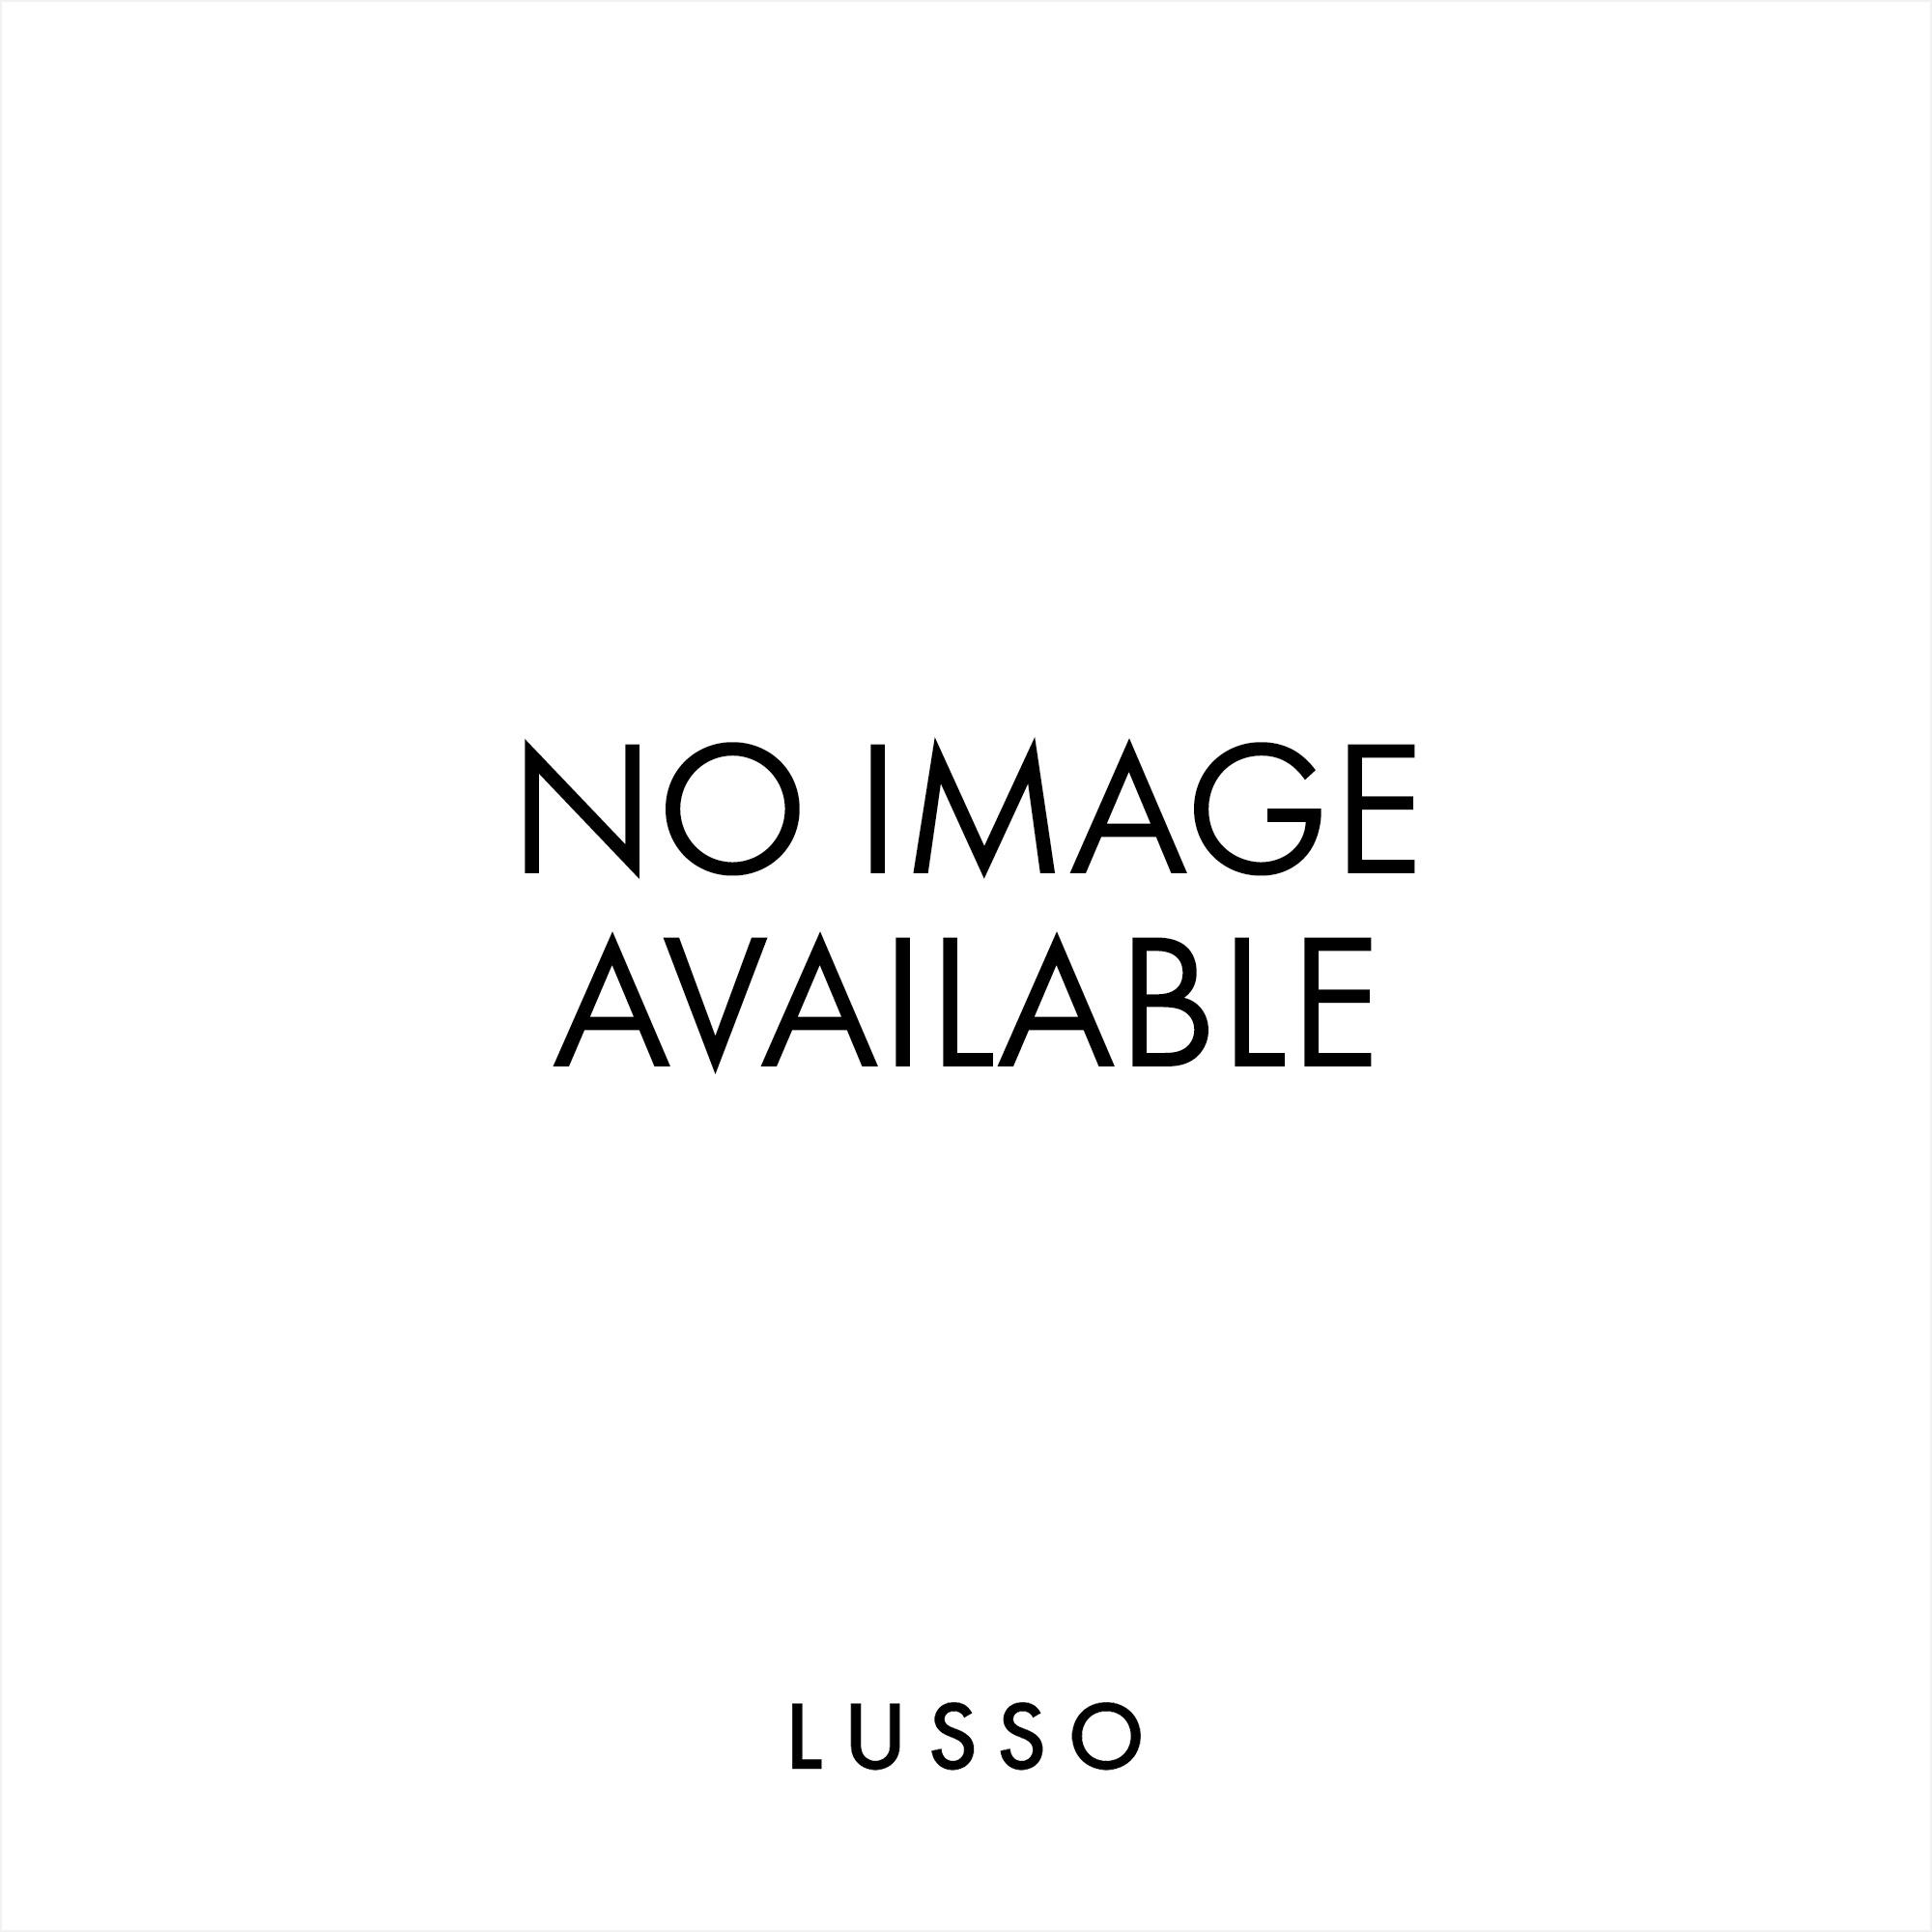 Luxury Bathroom Vanity Units Uk luxury bathroom vanity units | lusso stone